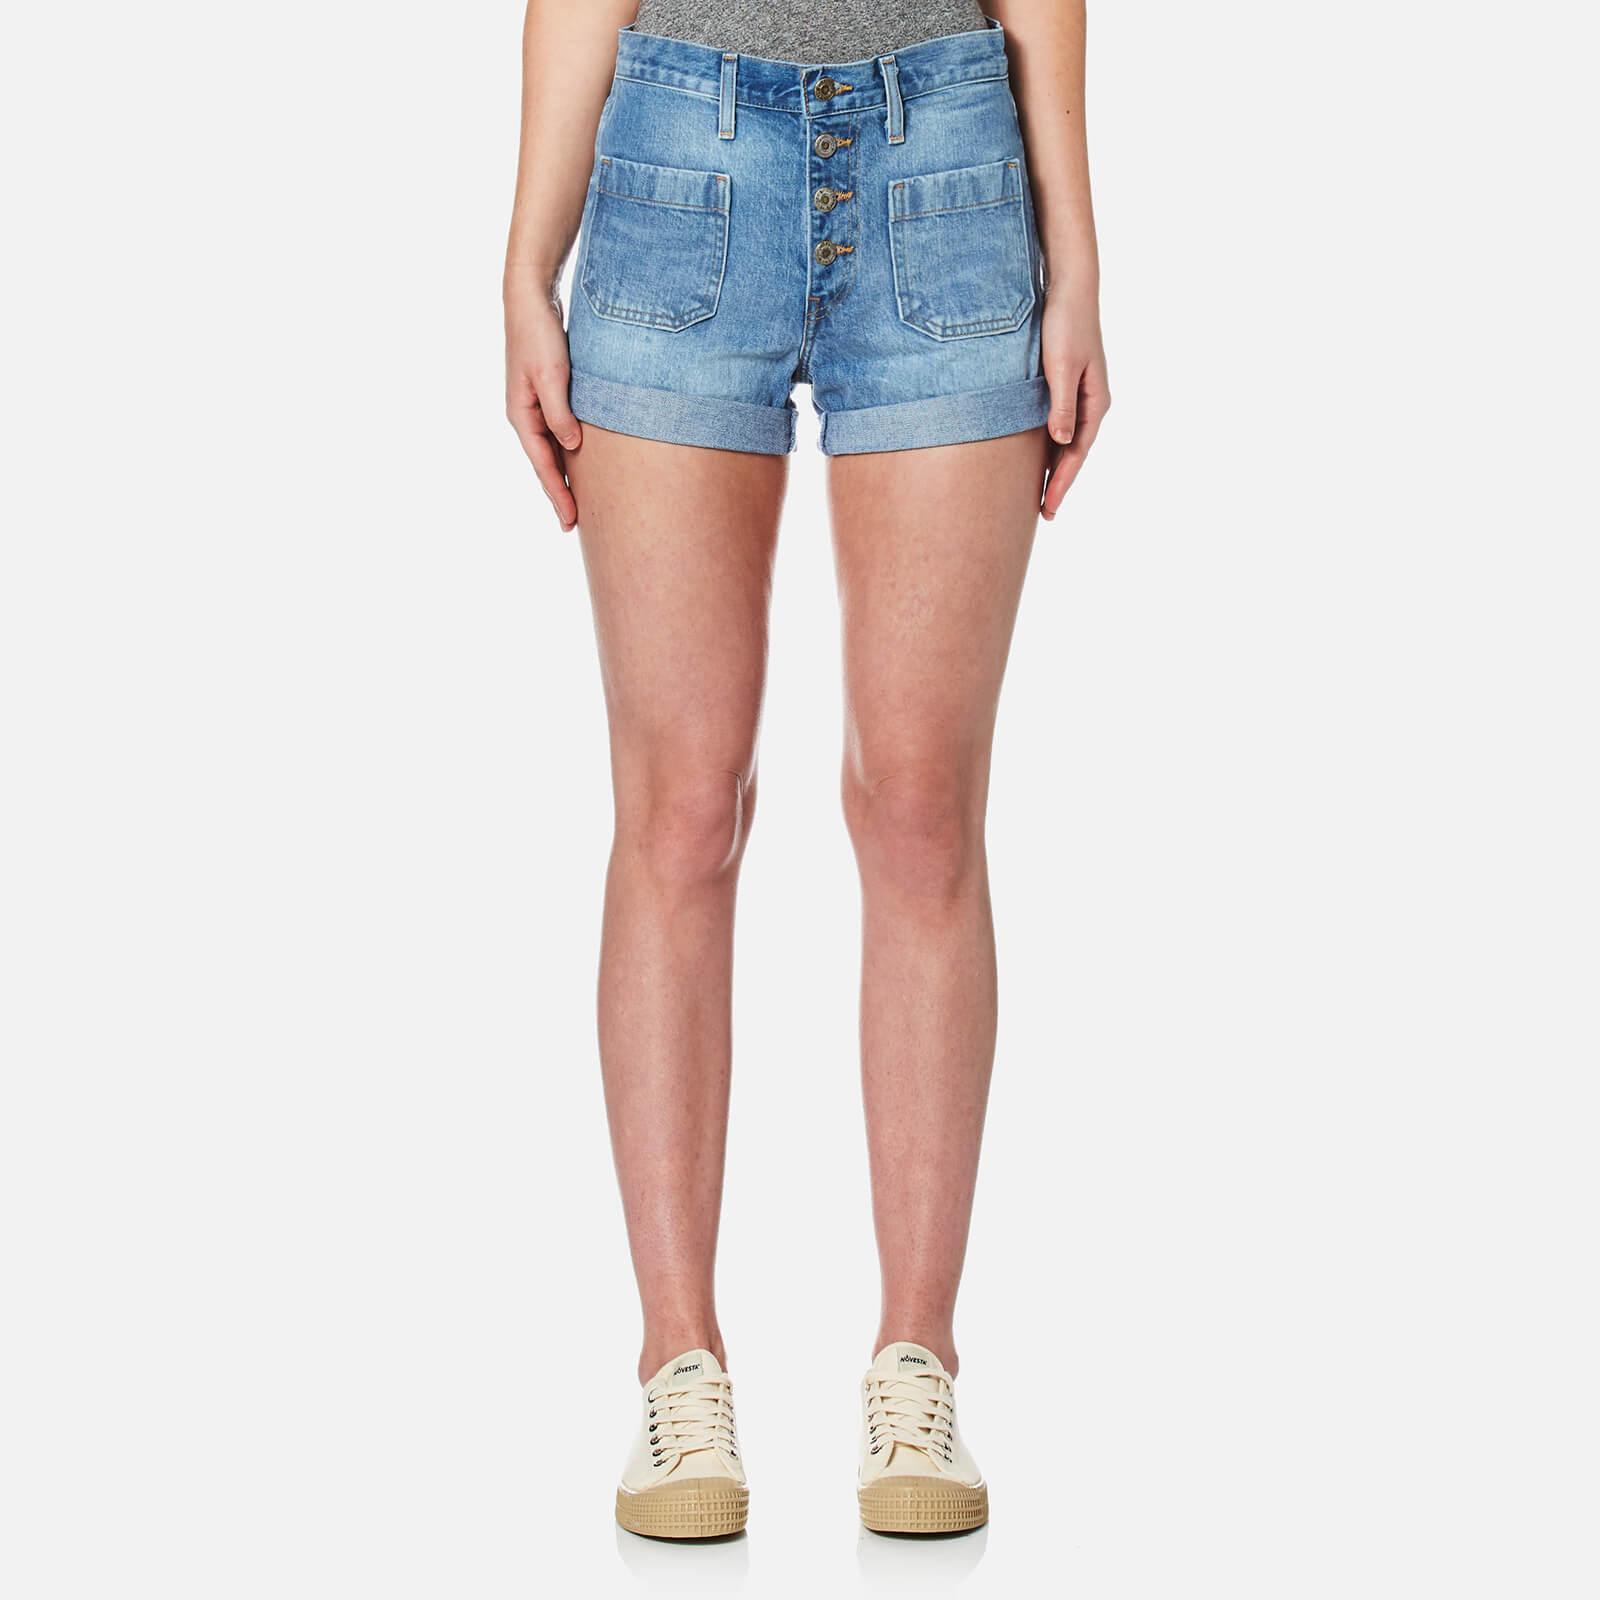 94b80c43 Levi's Women's Orange Tab Shorts - Kerouac Effect Womens Clothing    TheHut.com